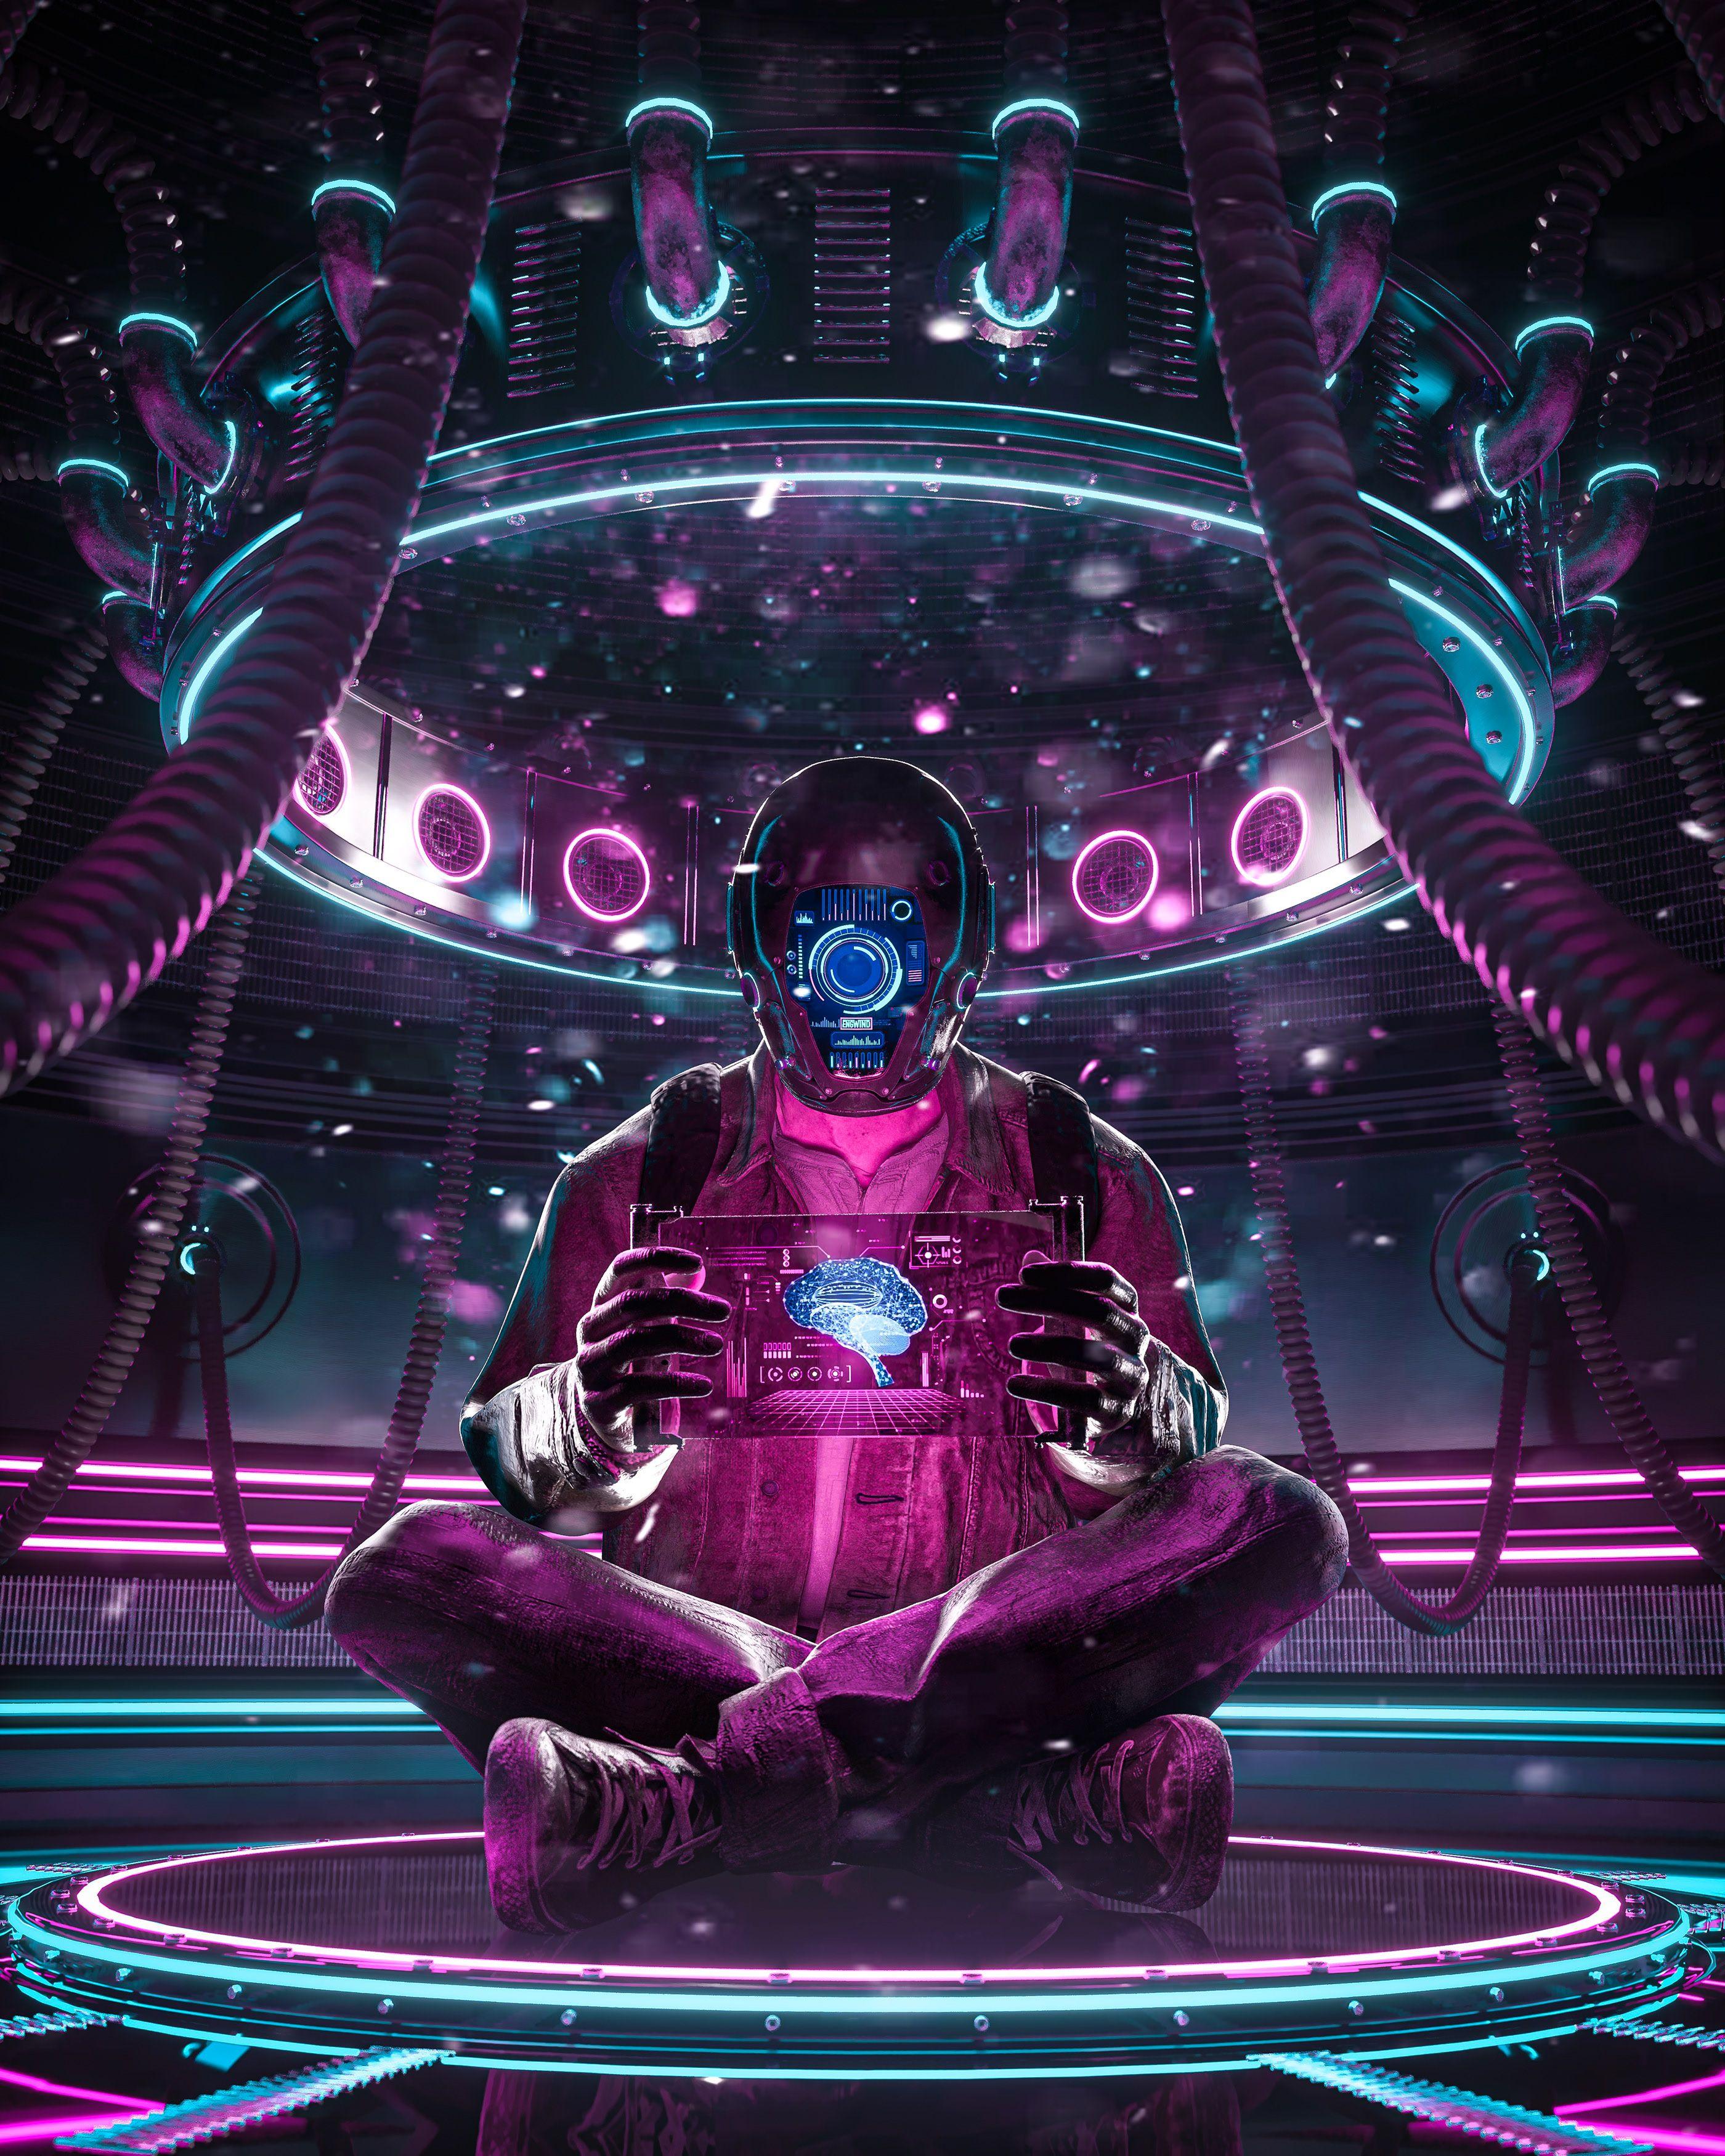 Neon Cyberpunk 3d Art By Engwind Cyberpunk Art Cyberpunk Aesthetic Art